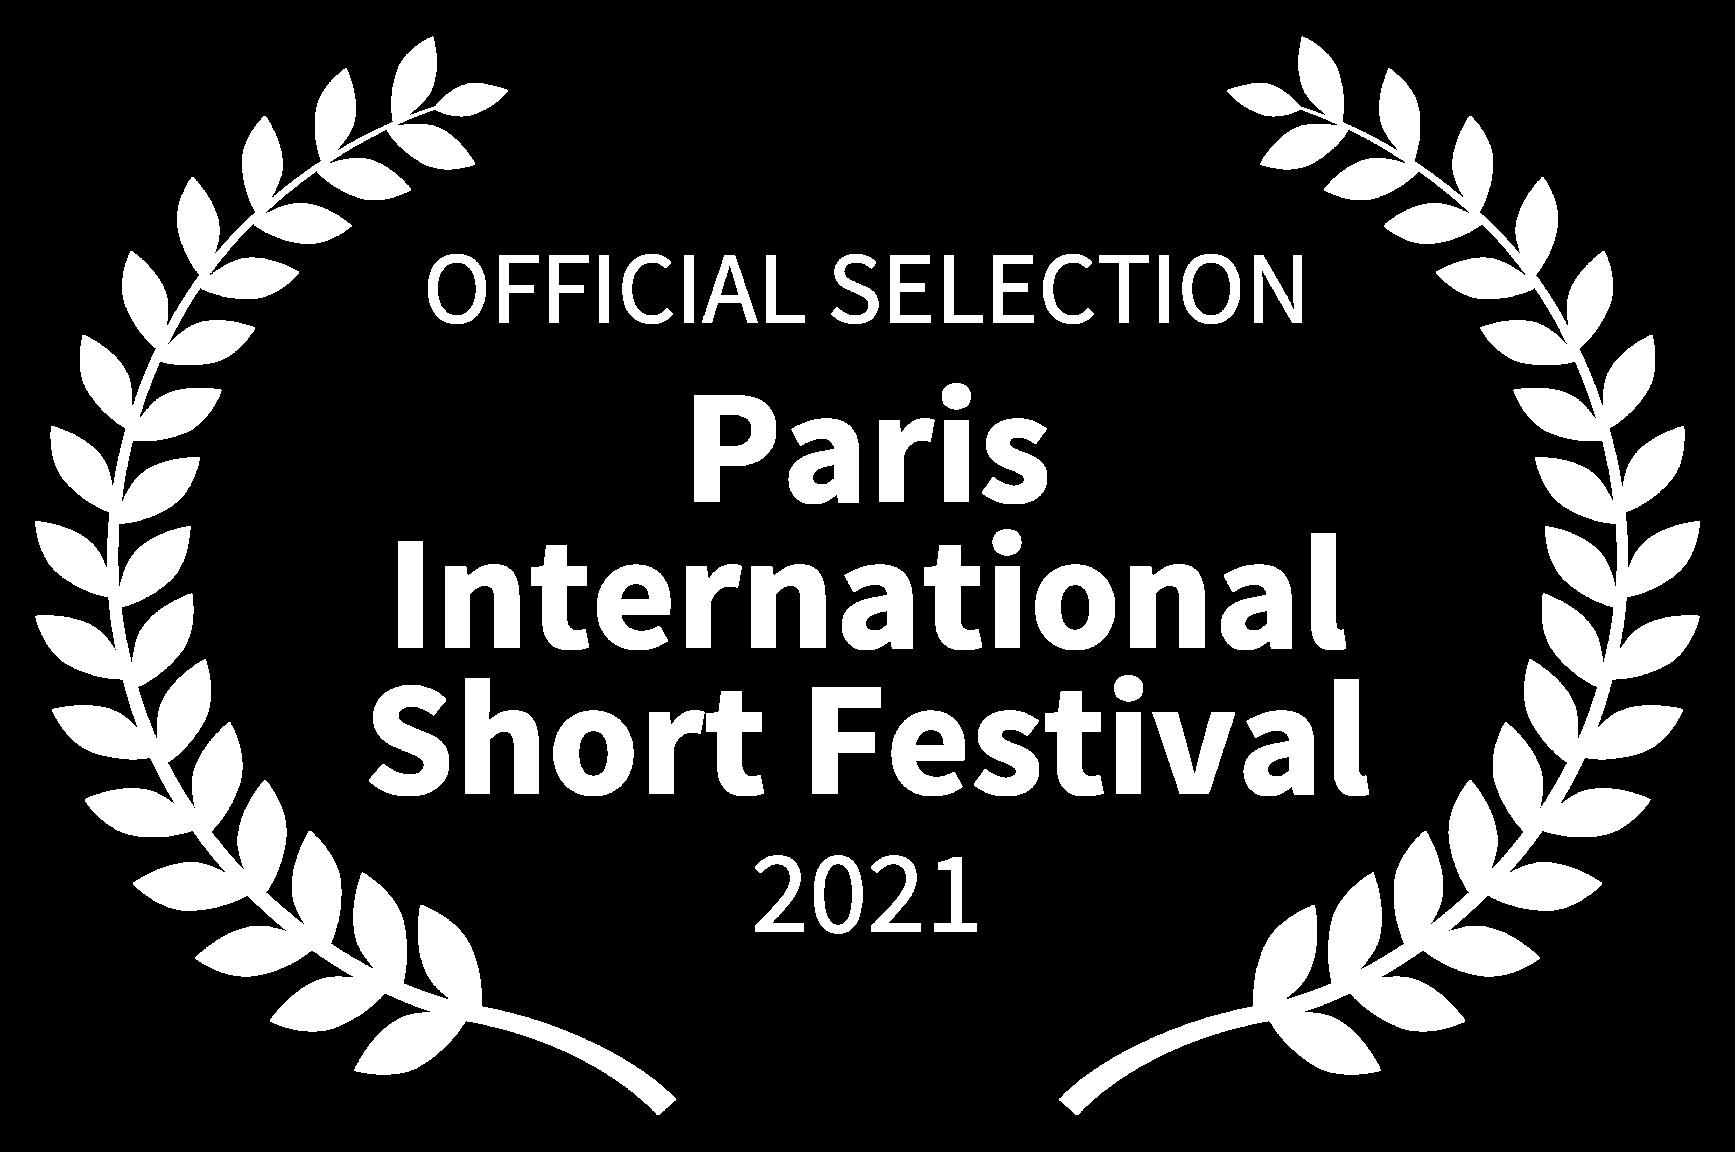 OFFICIAL SELECTION - Paris International Short Festival - 2021